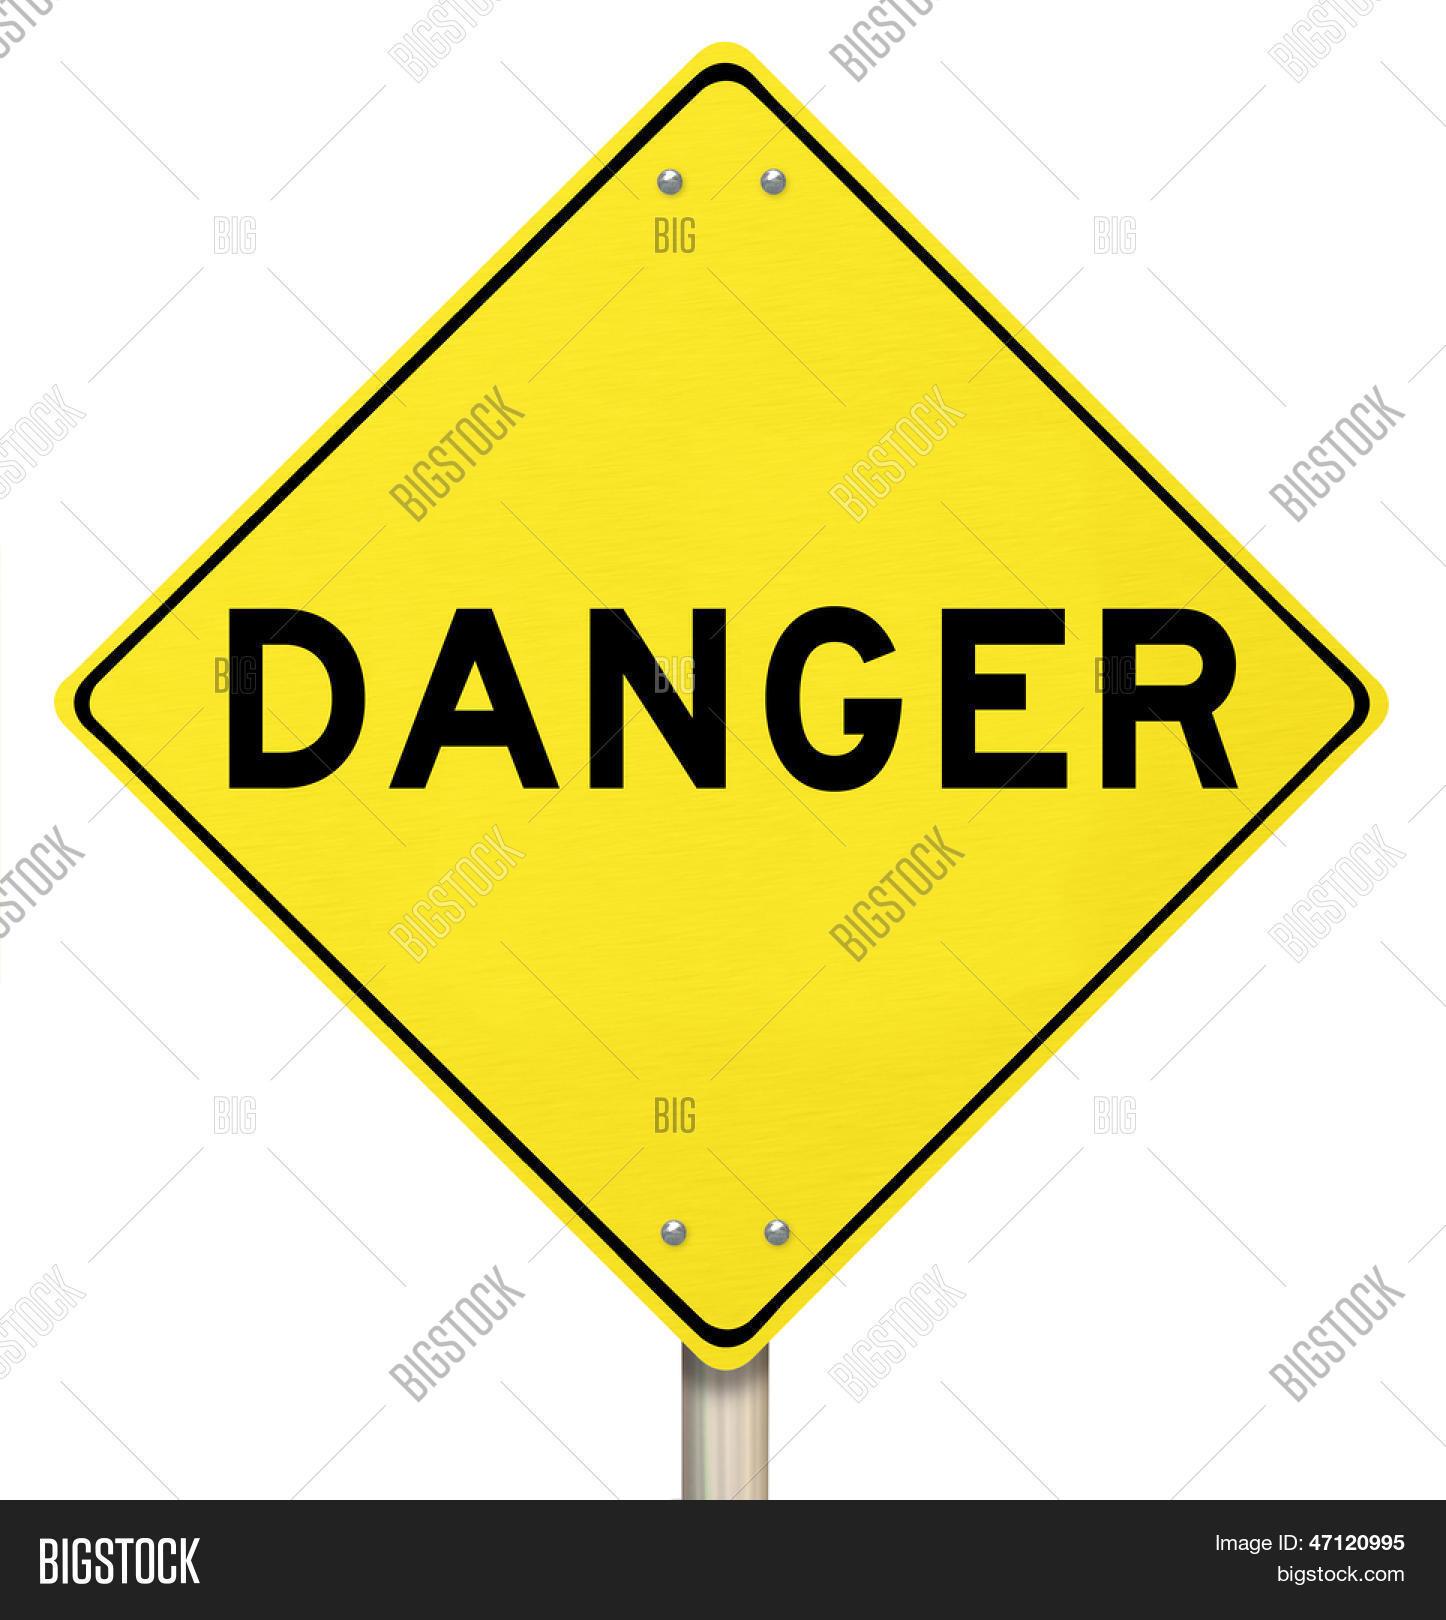 Yellow Diamond-shaped Road Sign Image & Photo | Bigstock